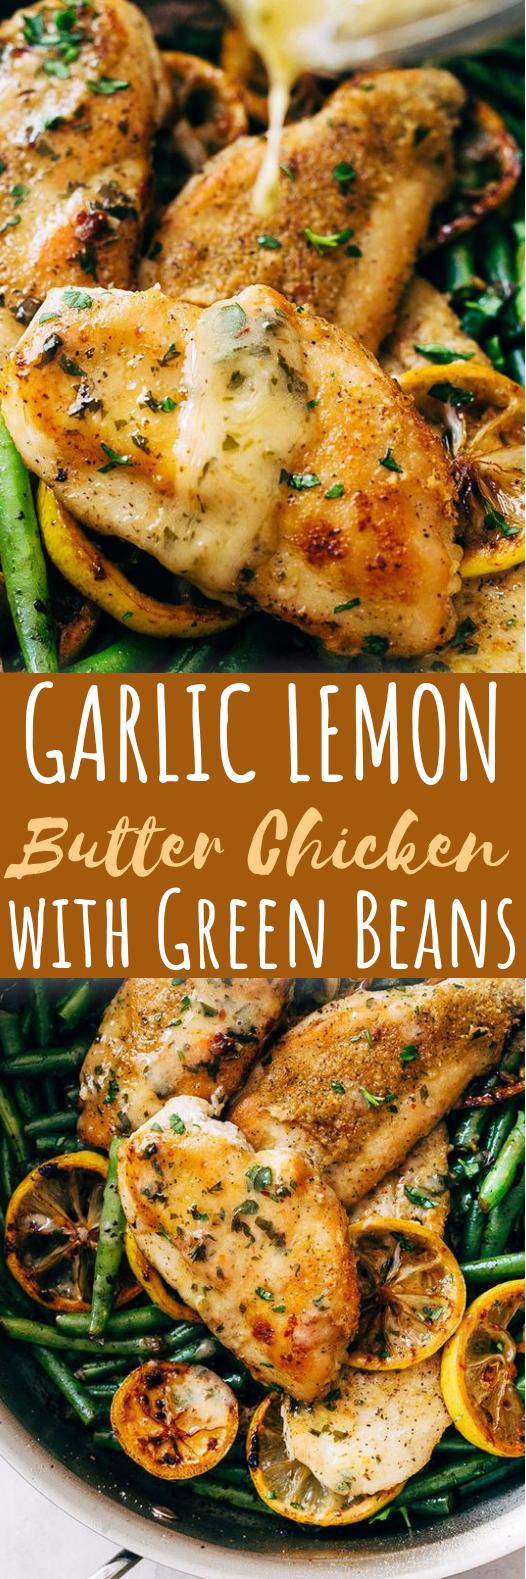 Skillet Garlic Lemon Butter Chicken #dinner #chicken